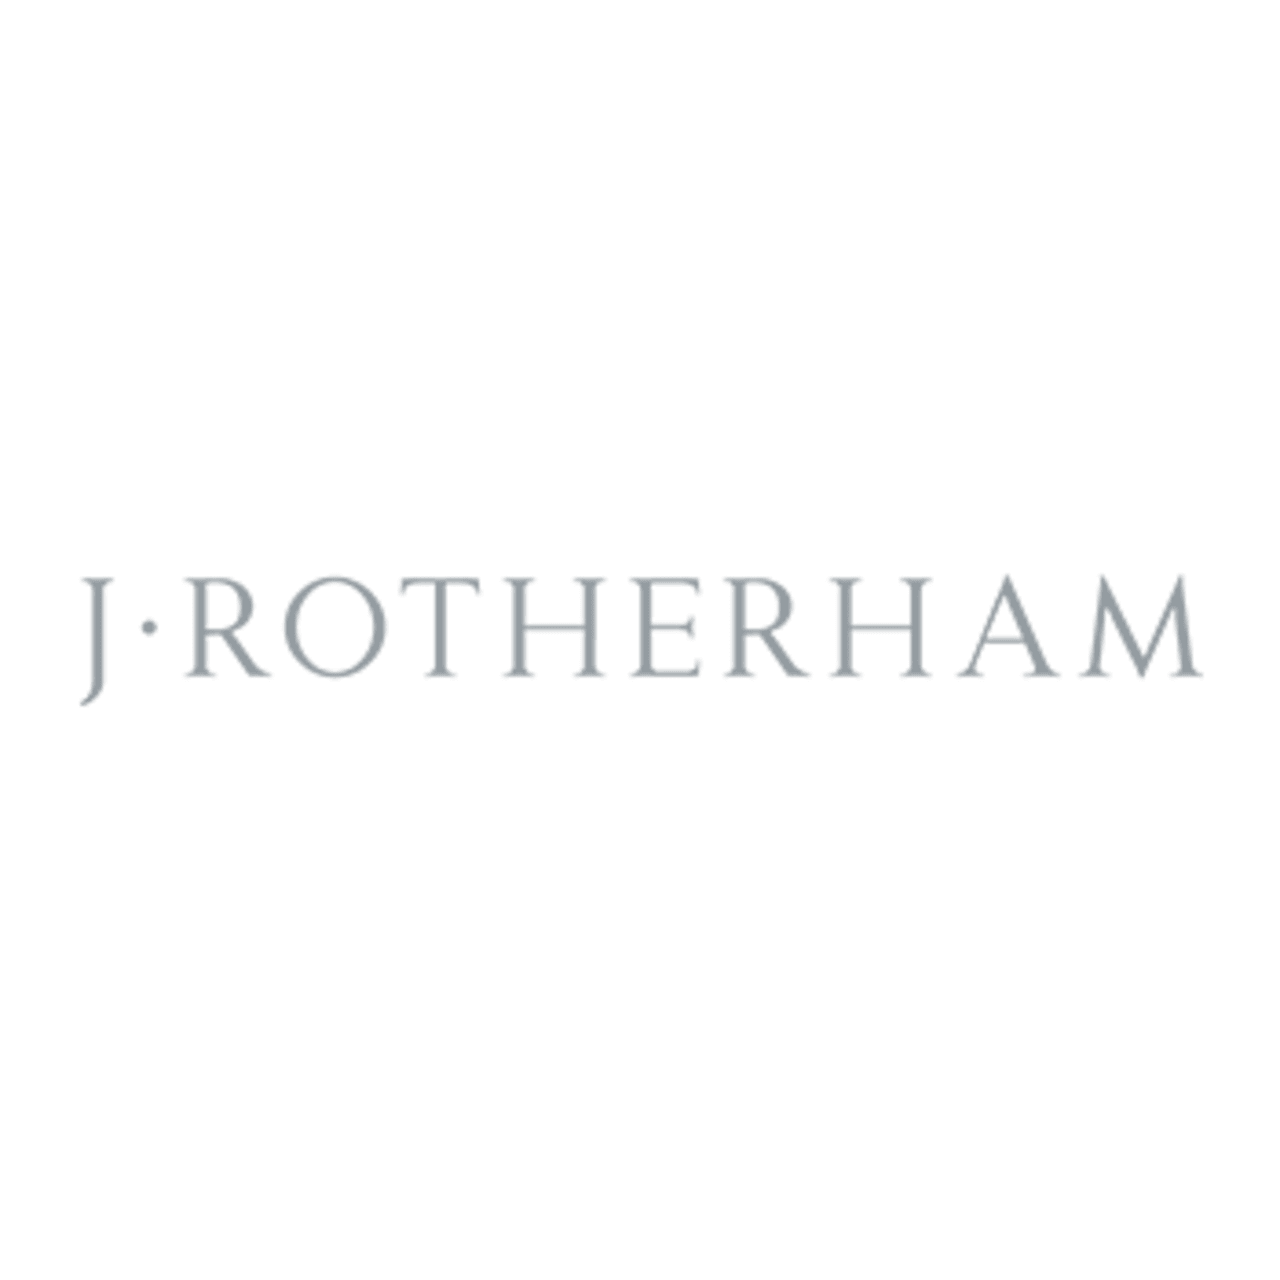 LOGO JROTHERHAM